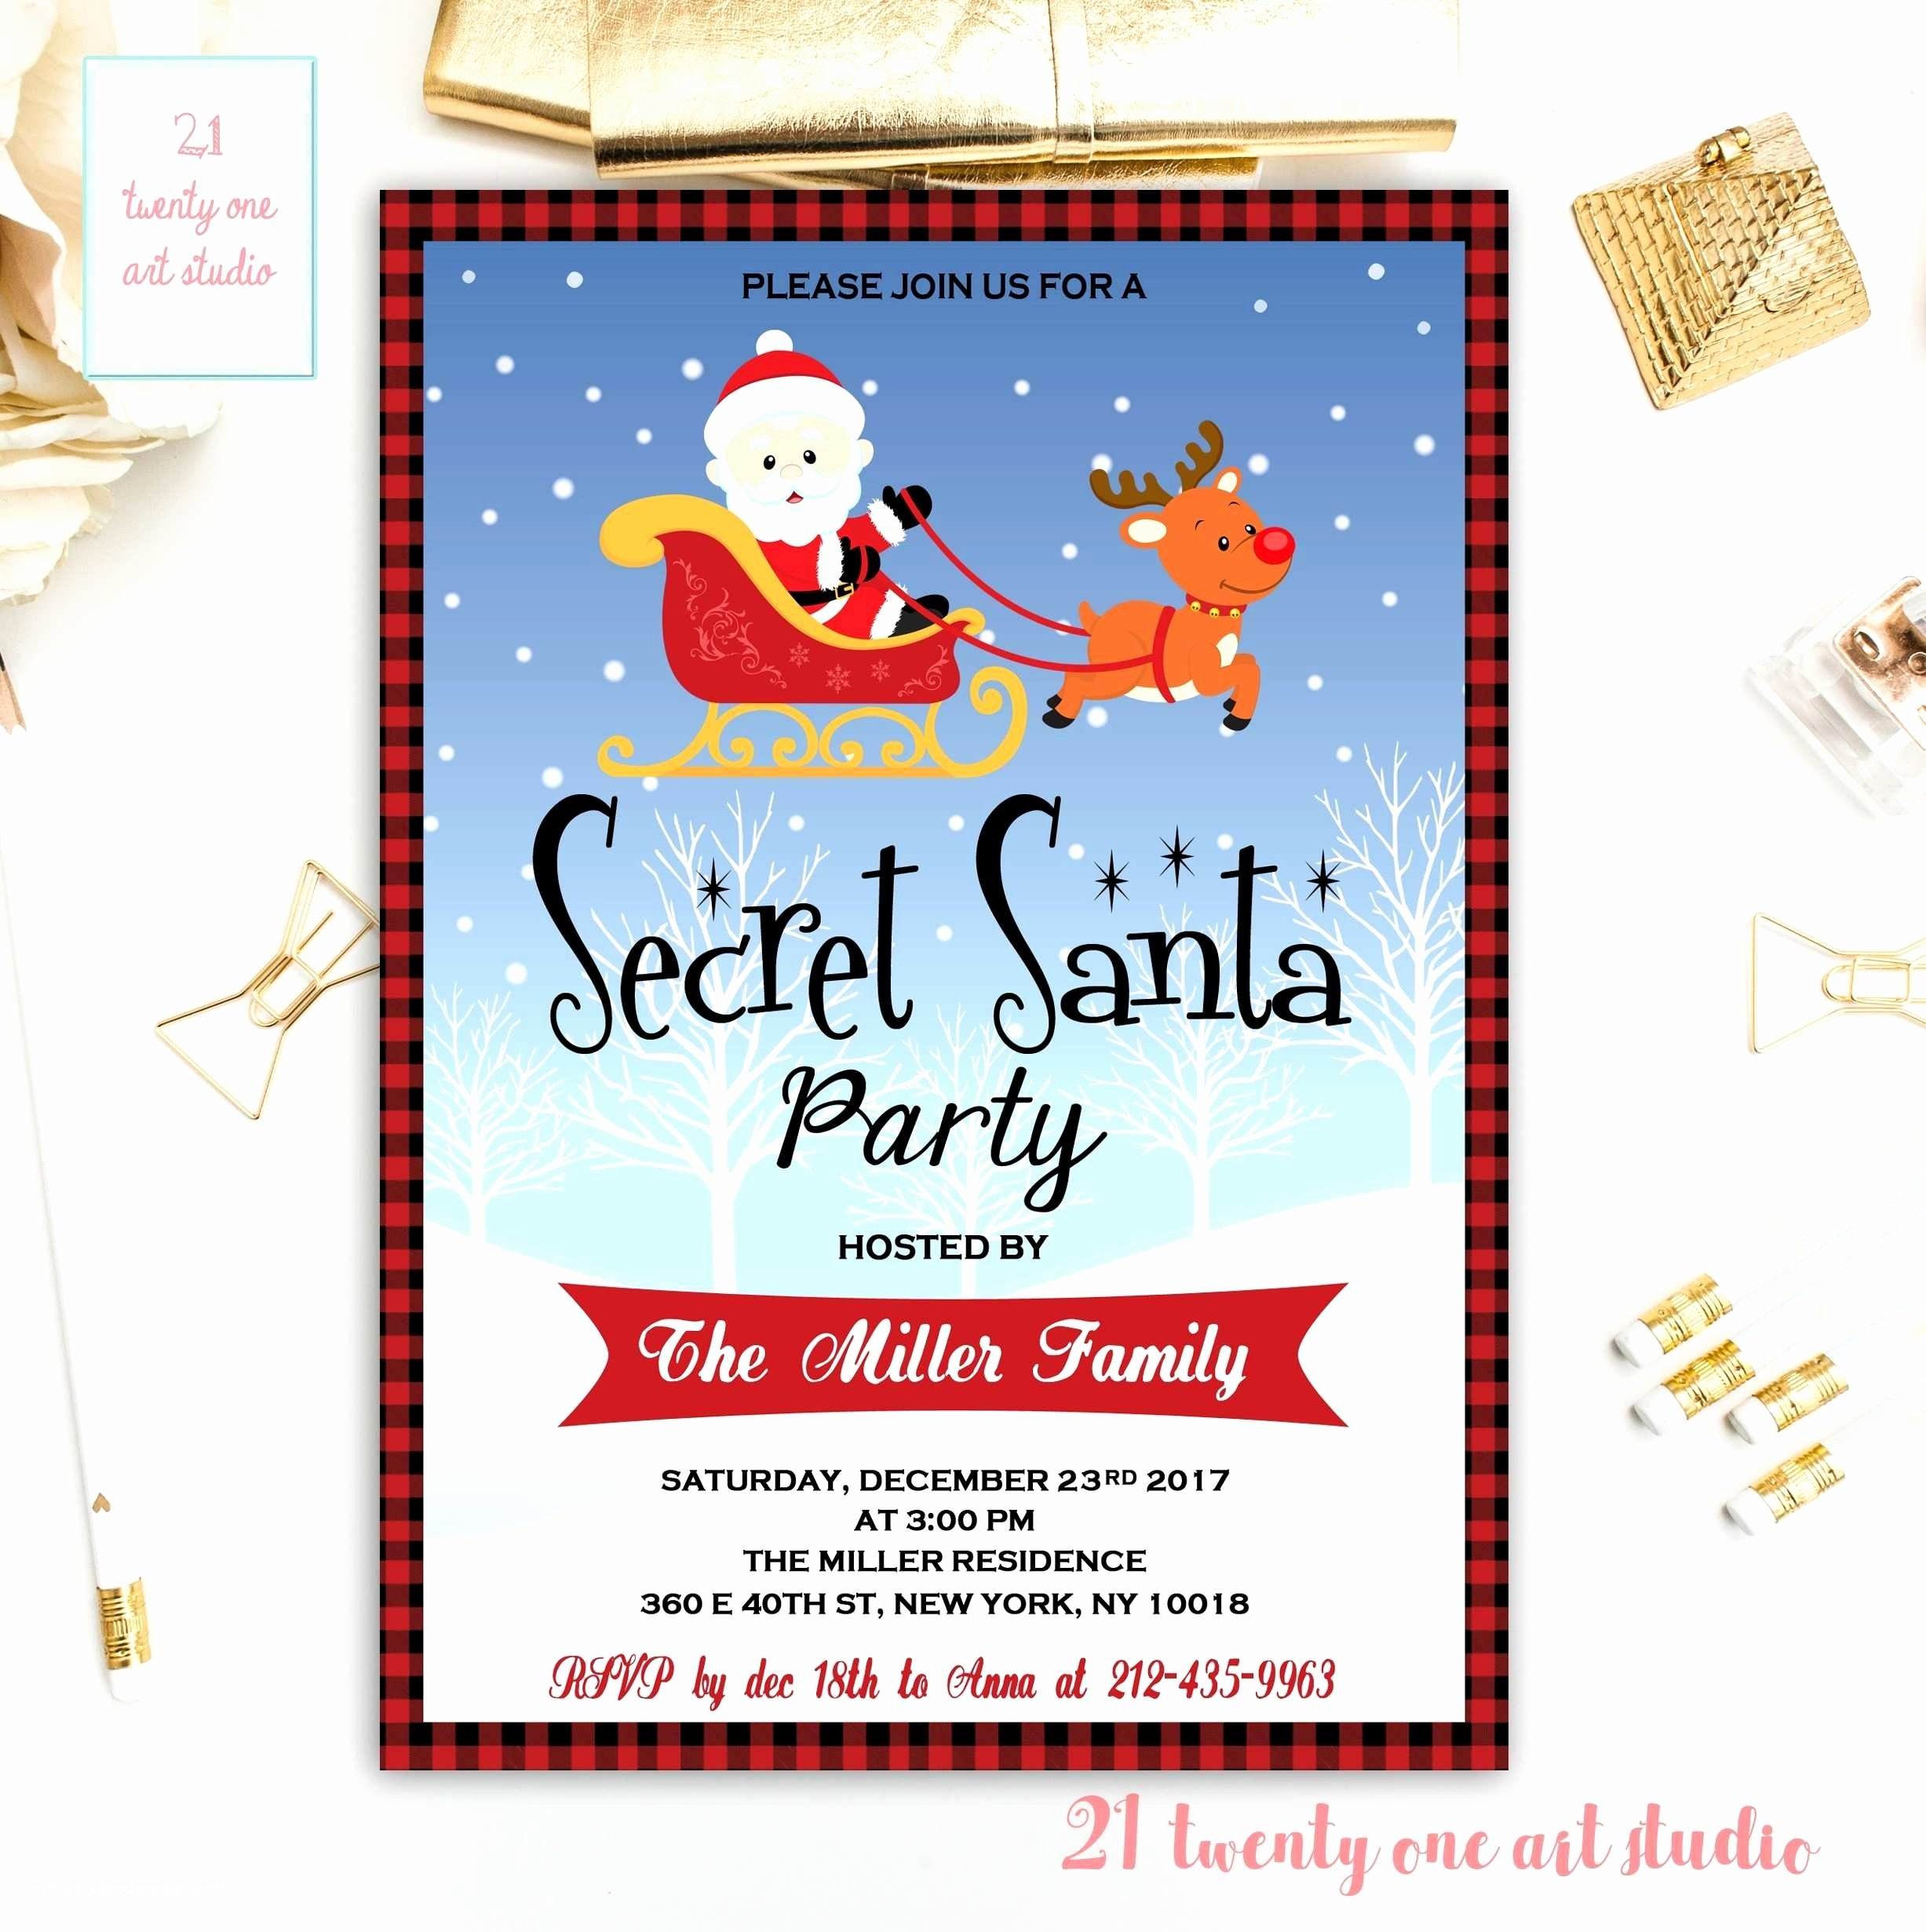 Lovely Print Christmas Cards Online   Birthday Card   Greeting Card - Free Printable Christmas Cards With Photo Insert